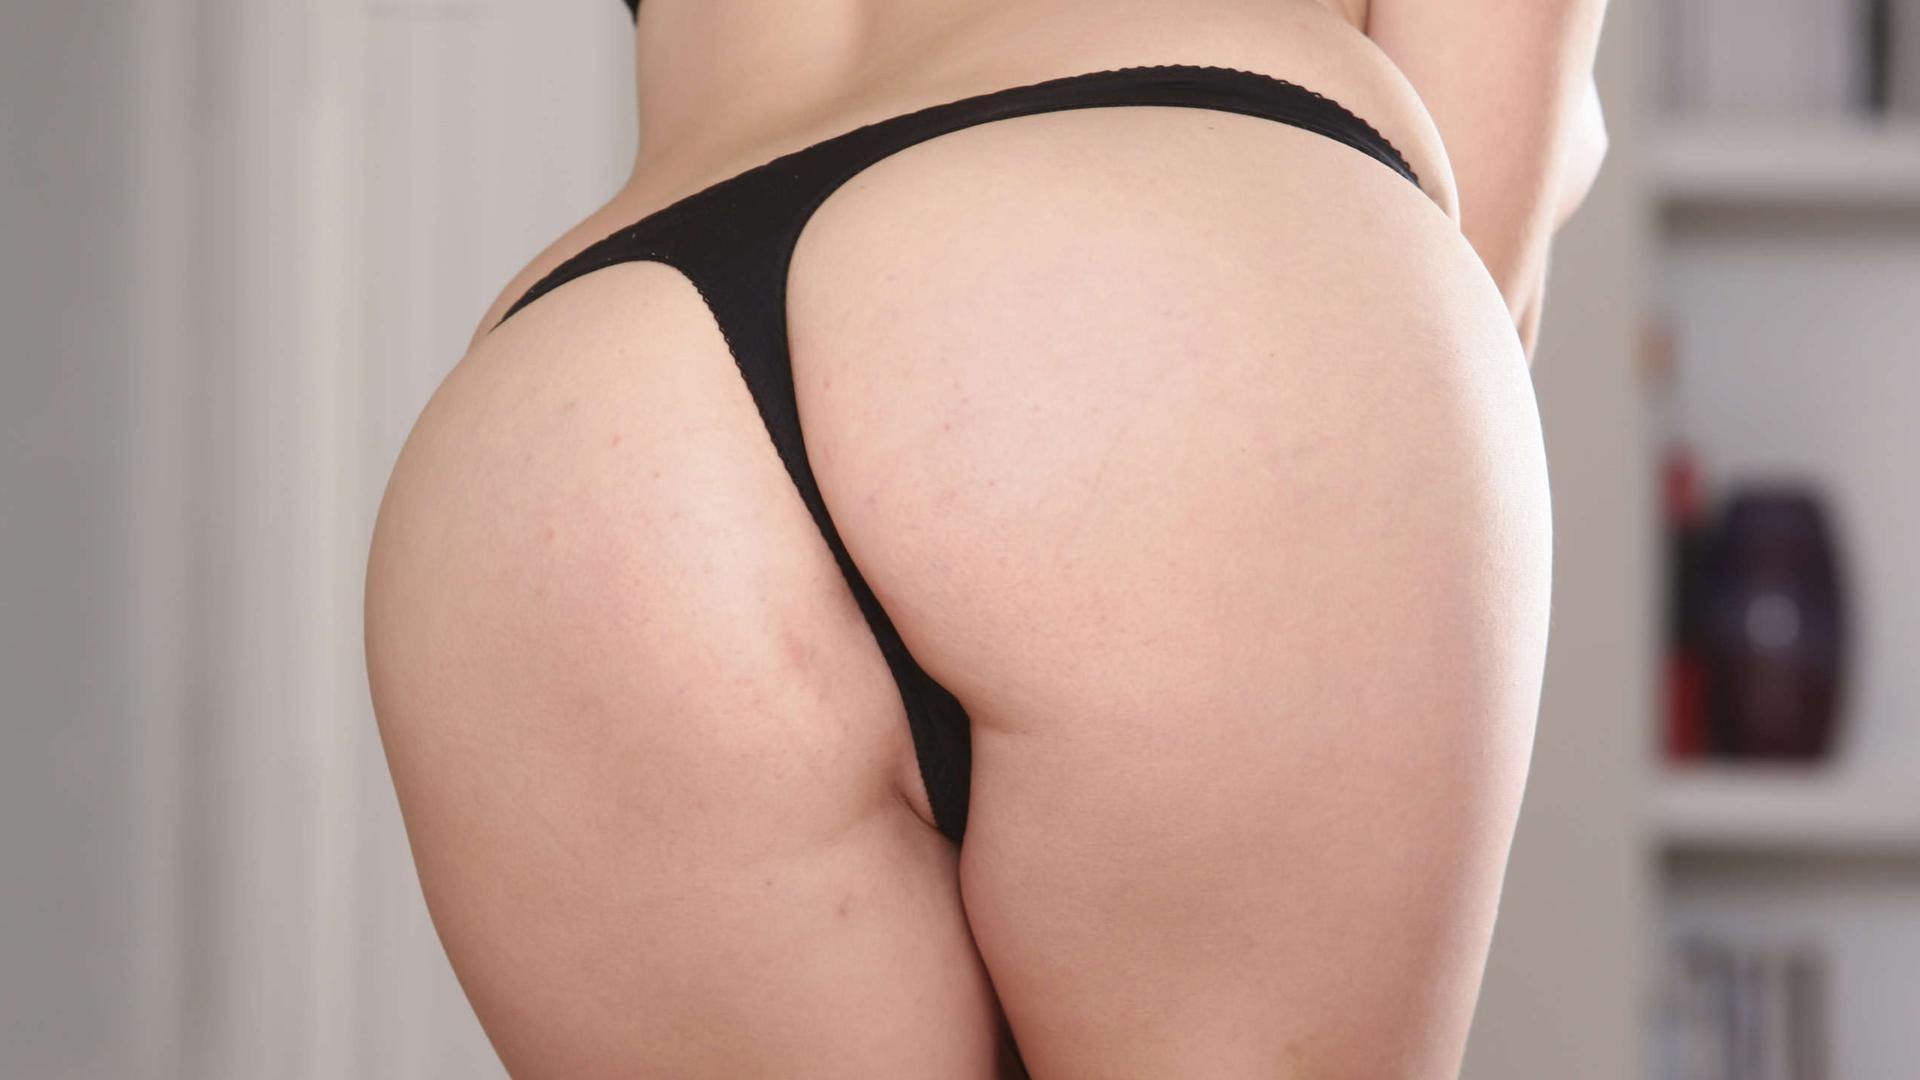 Download photo 1920x1080, marina visconti, sexy girl, ass ...